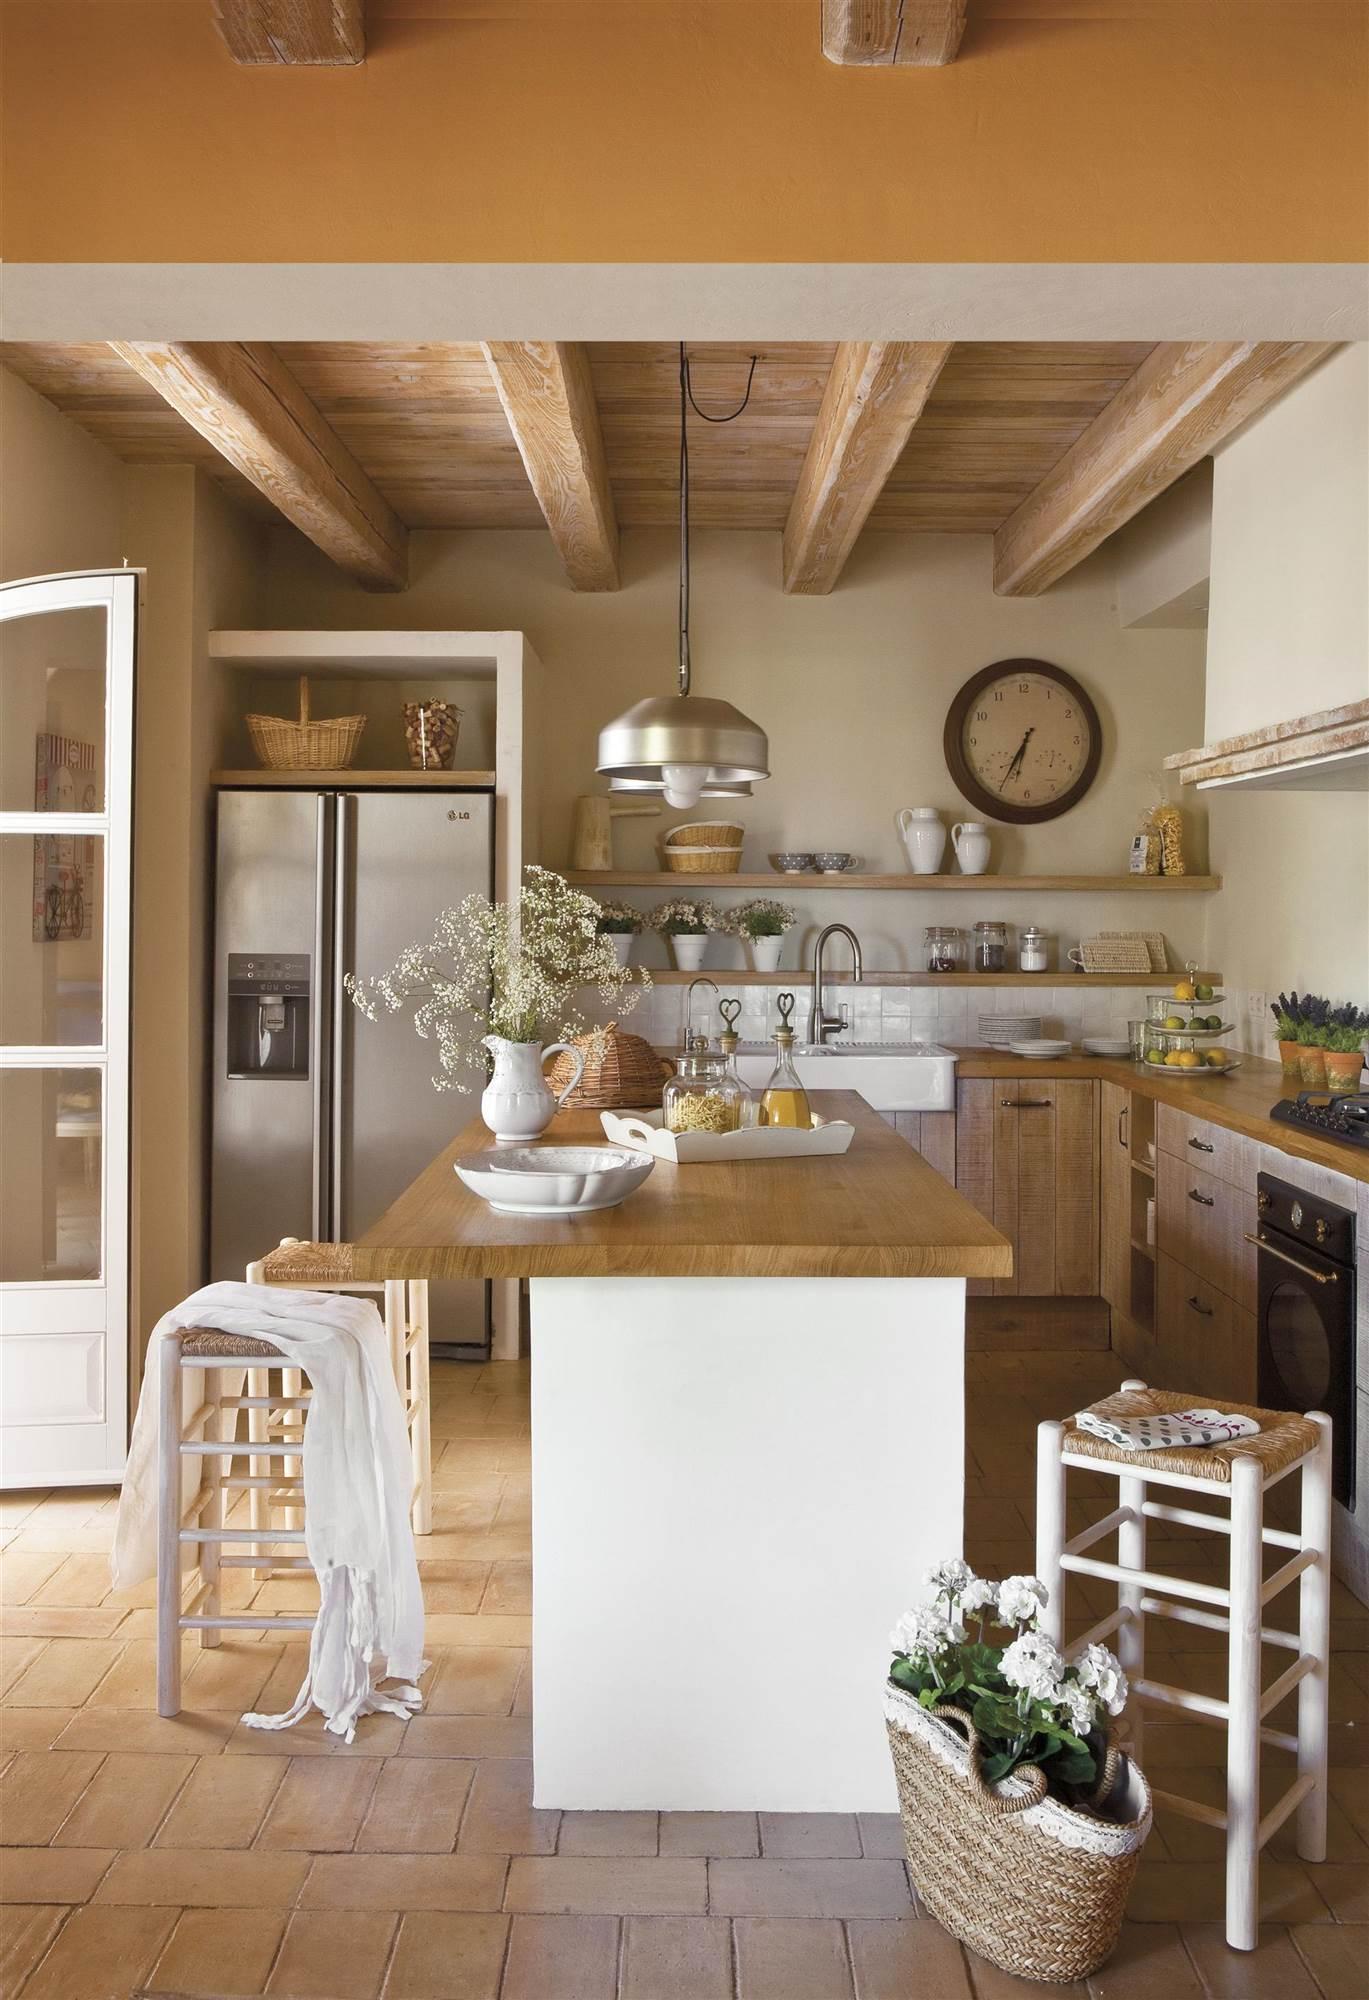 658eba1d5c4 7 cocinas decoradas con diferentes estilos